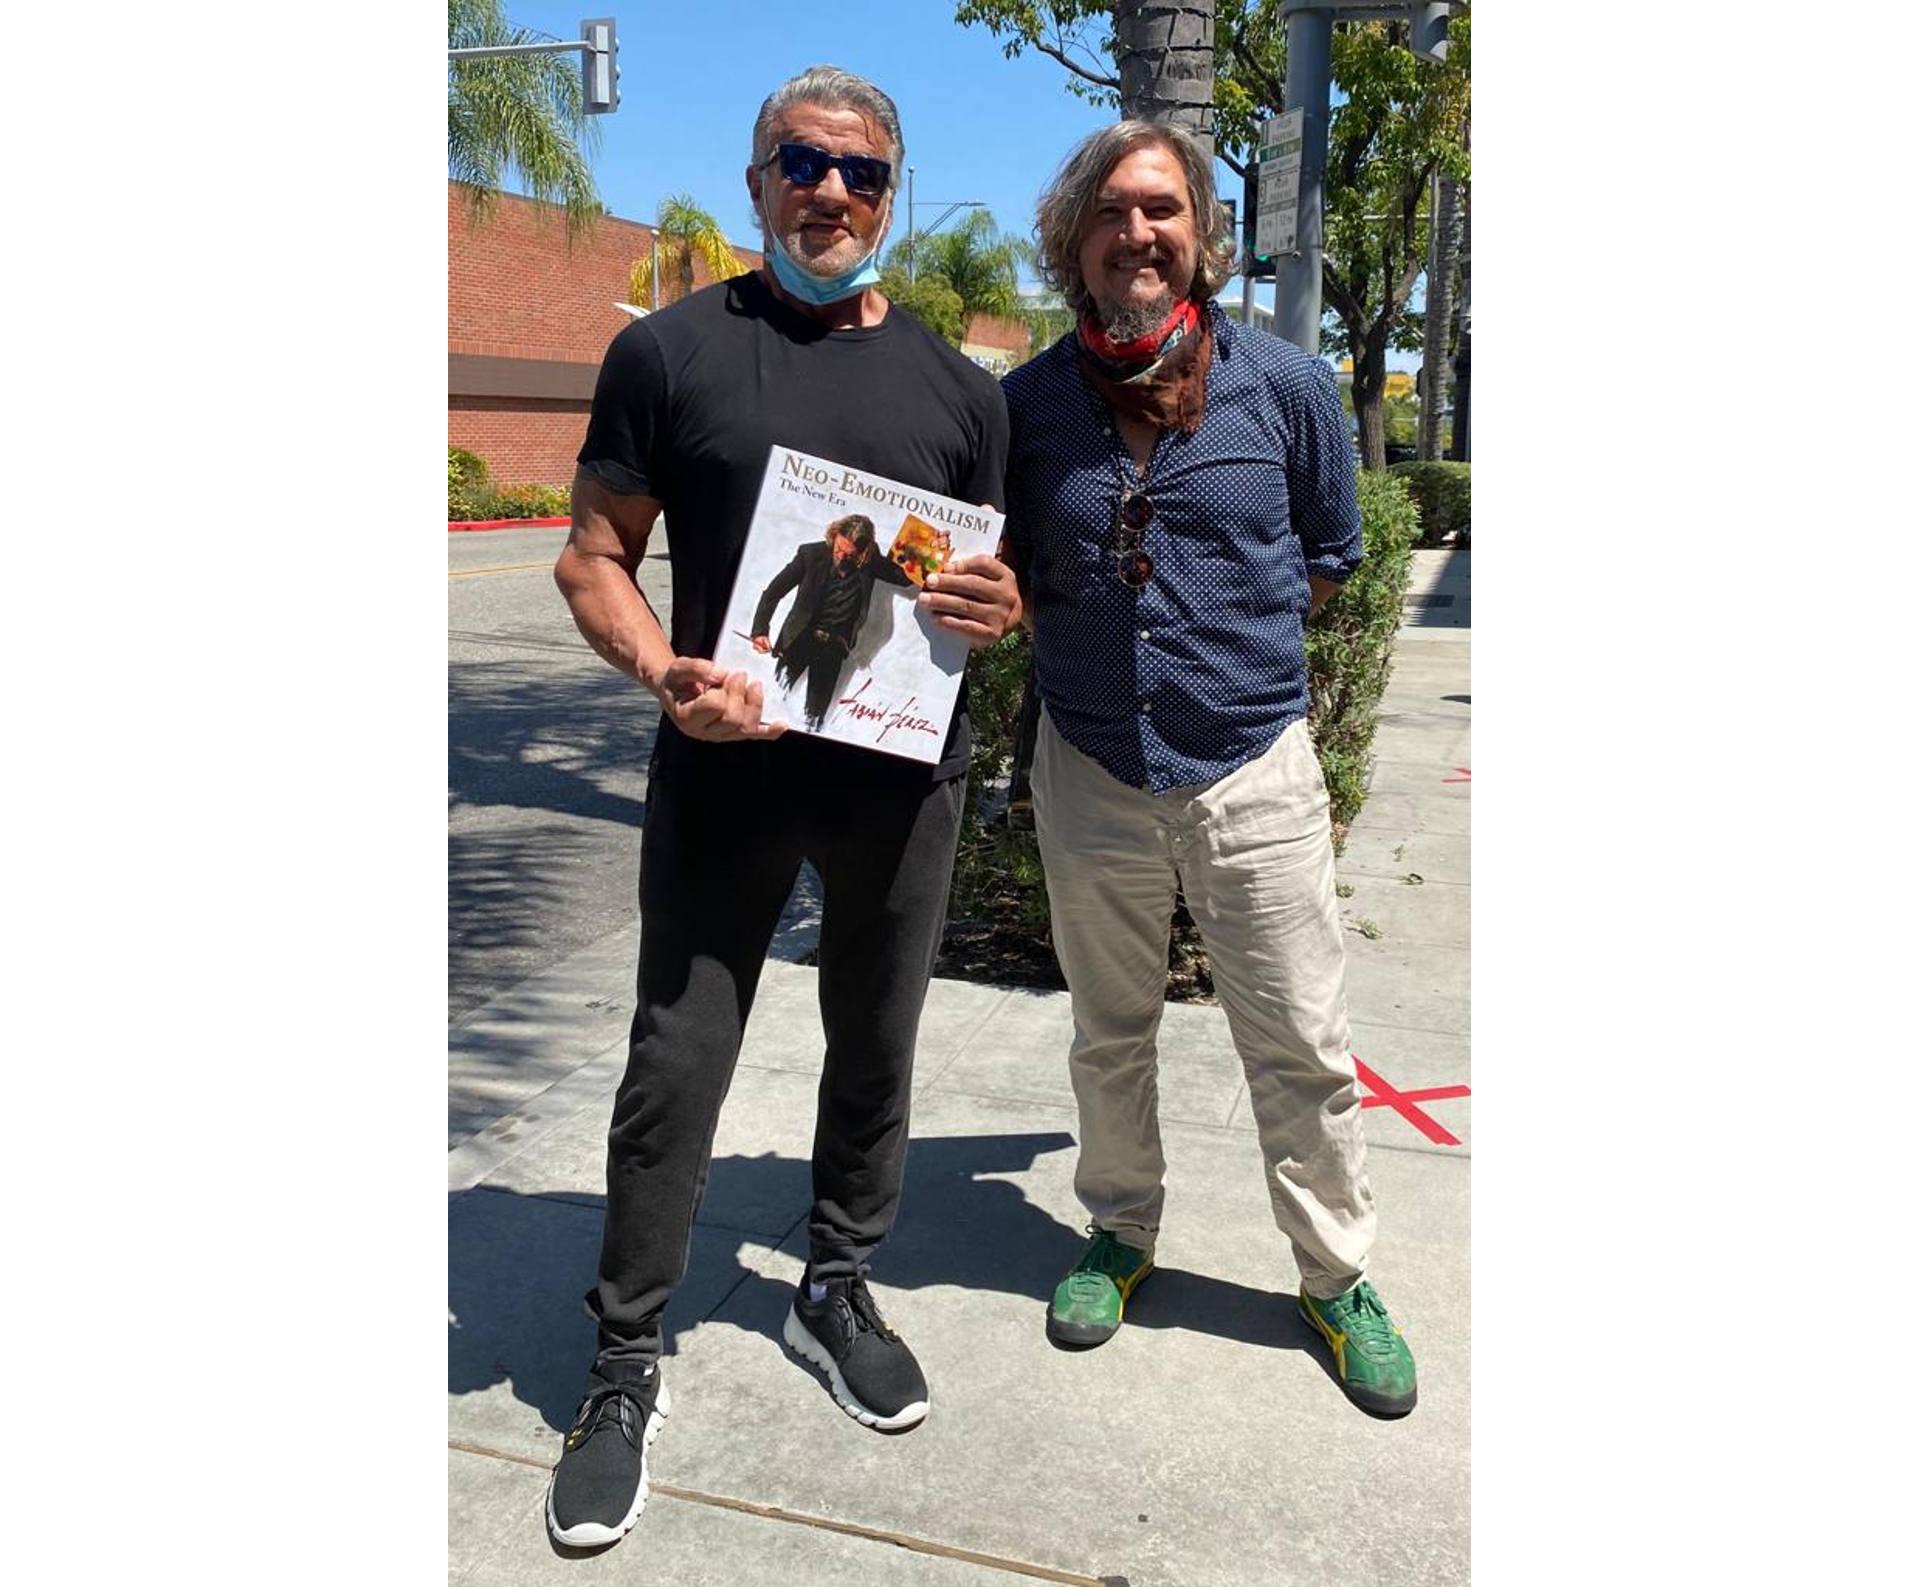 Sylvester Stallone holding art book next to Fabian Perez